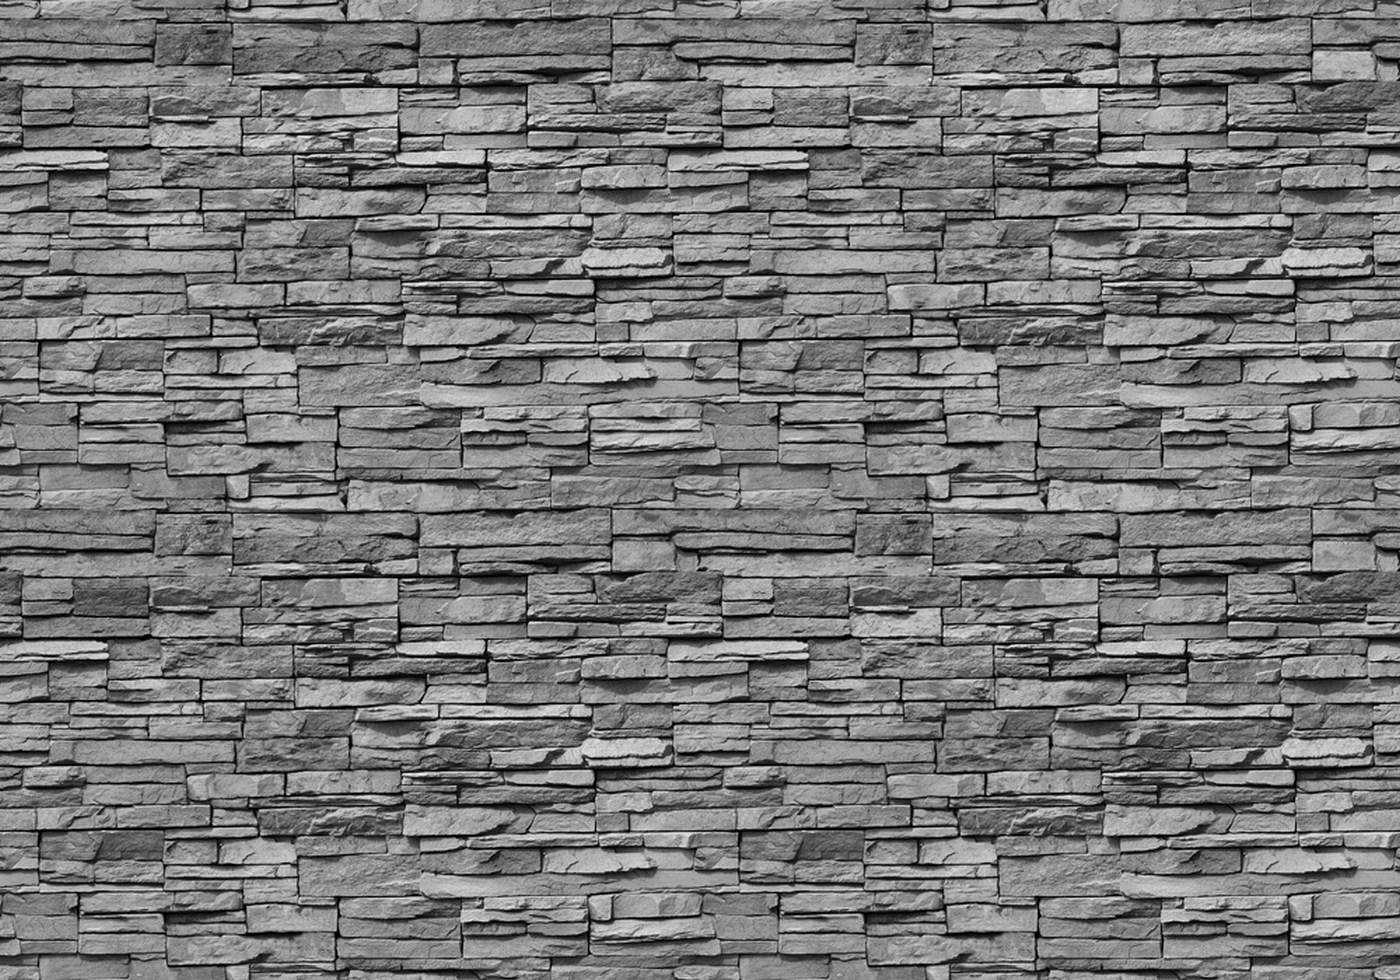 Kiss fototapeten zu besten preisen fototapete asian stone wall no 2 steinwand tapete - Steinwand anthrazit ...